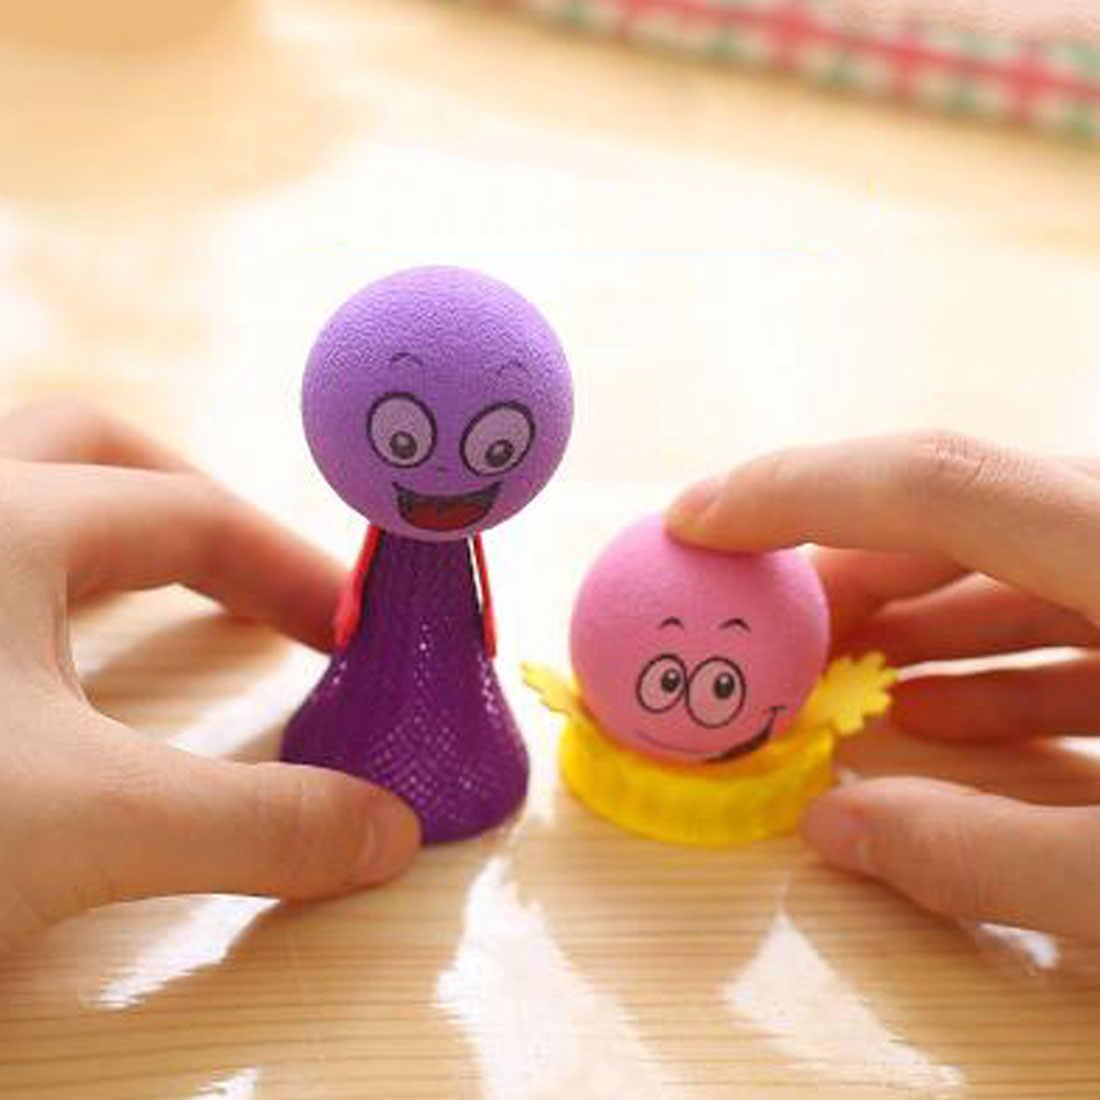 Baru Memantul Elf Mainan untuk Anak Memeras Melompat Bounce Elf Lelucon Mainan untuk Anak-anak Pesta TK Permainan Paskah Hadir